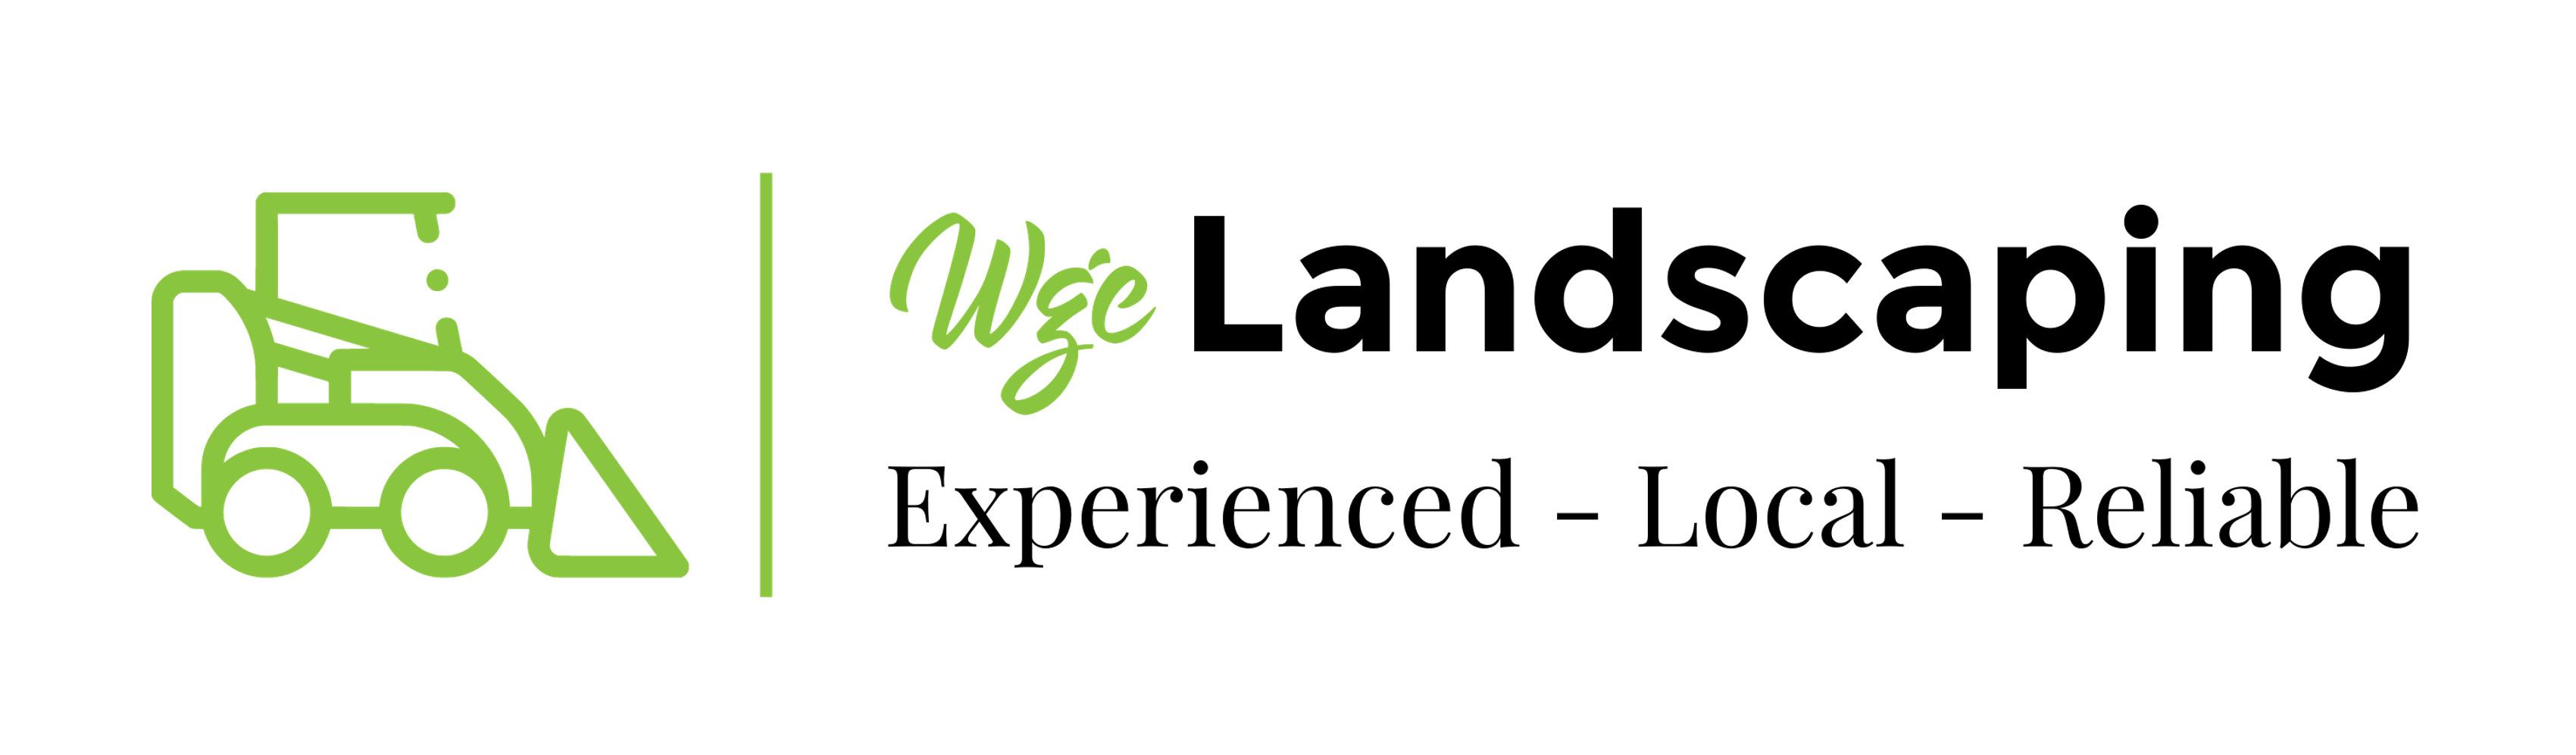 WGC Landscaping